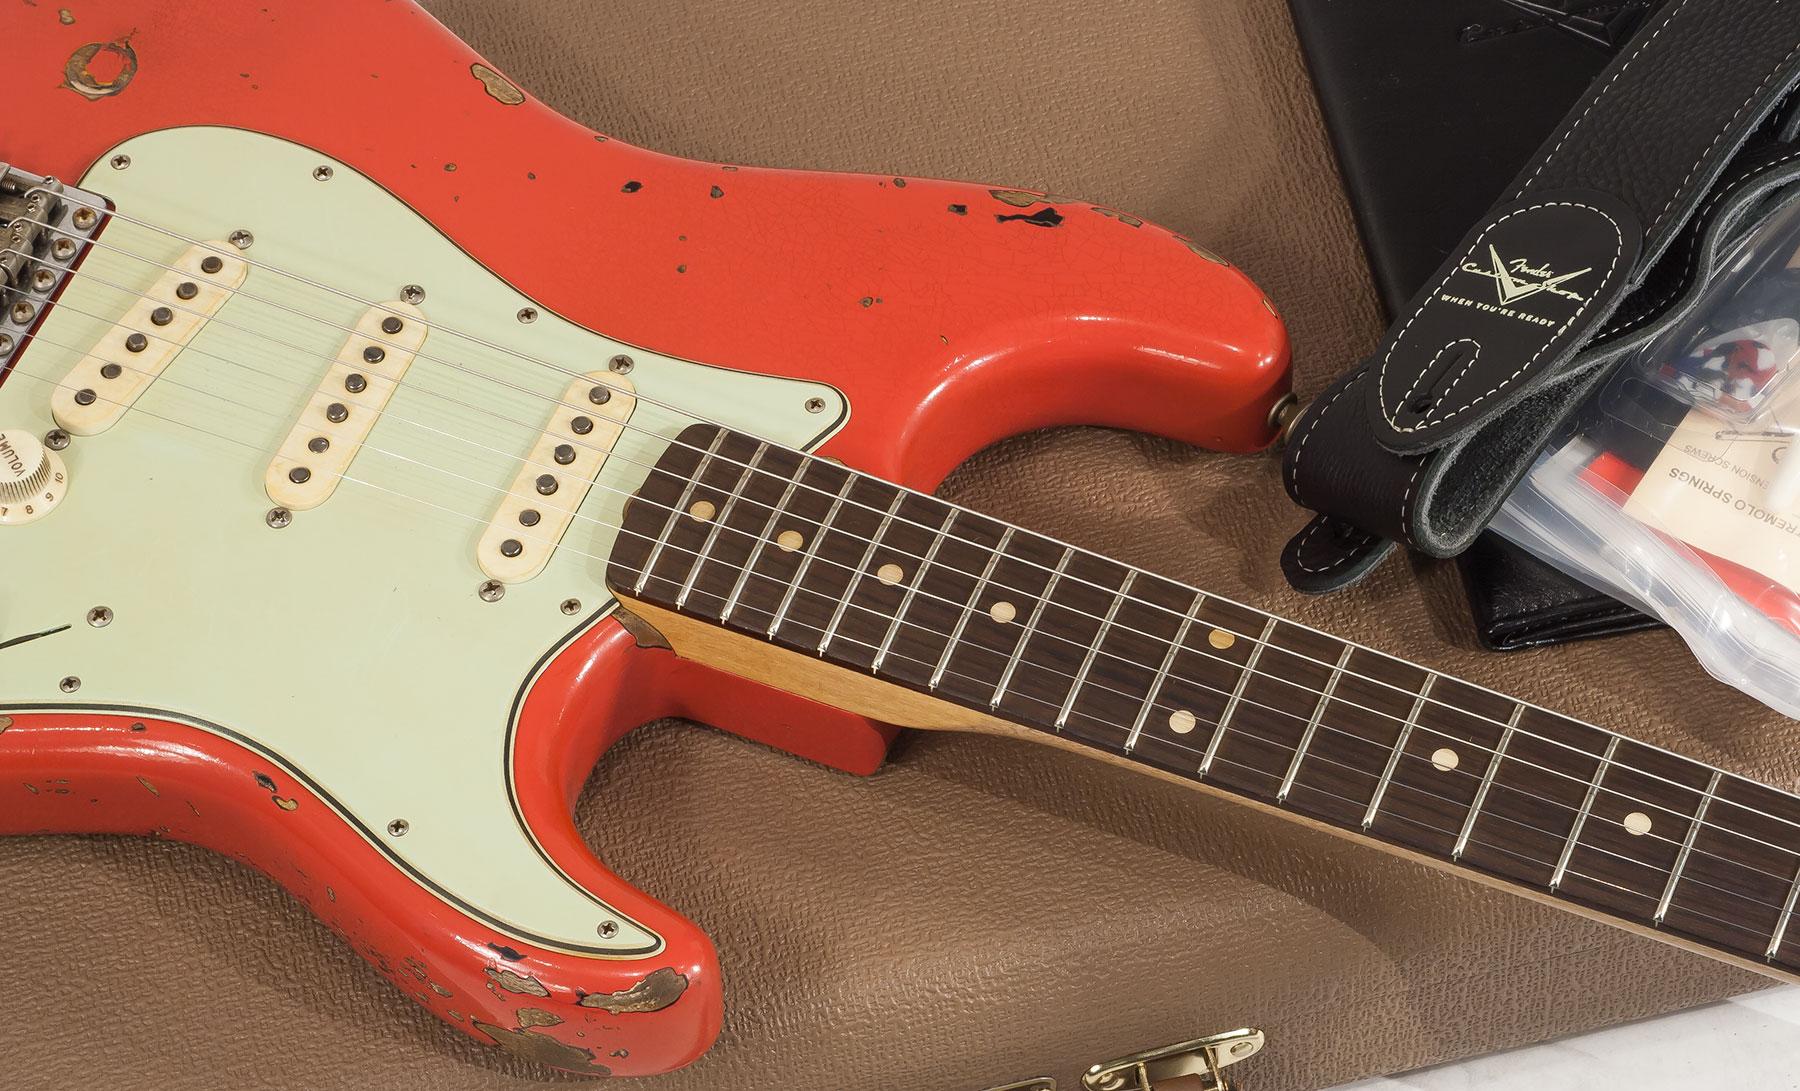 Custom Shop Stratocaster Michael Landau 1963 Masterbuilt J Smith - relic  fiesta red/sunburst